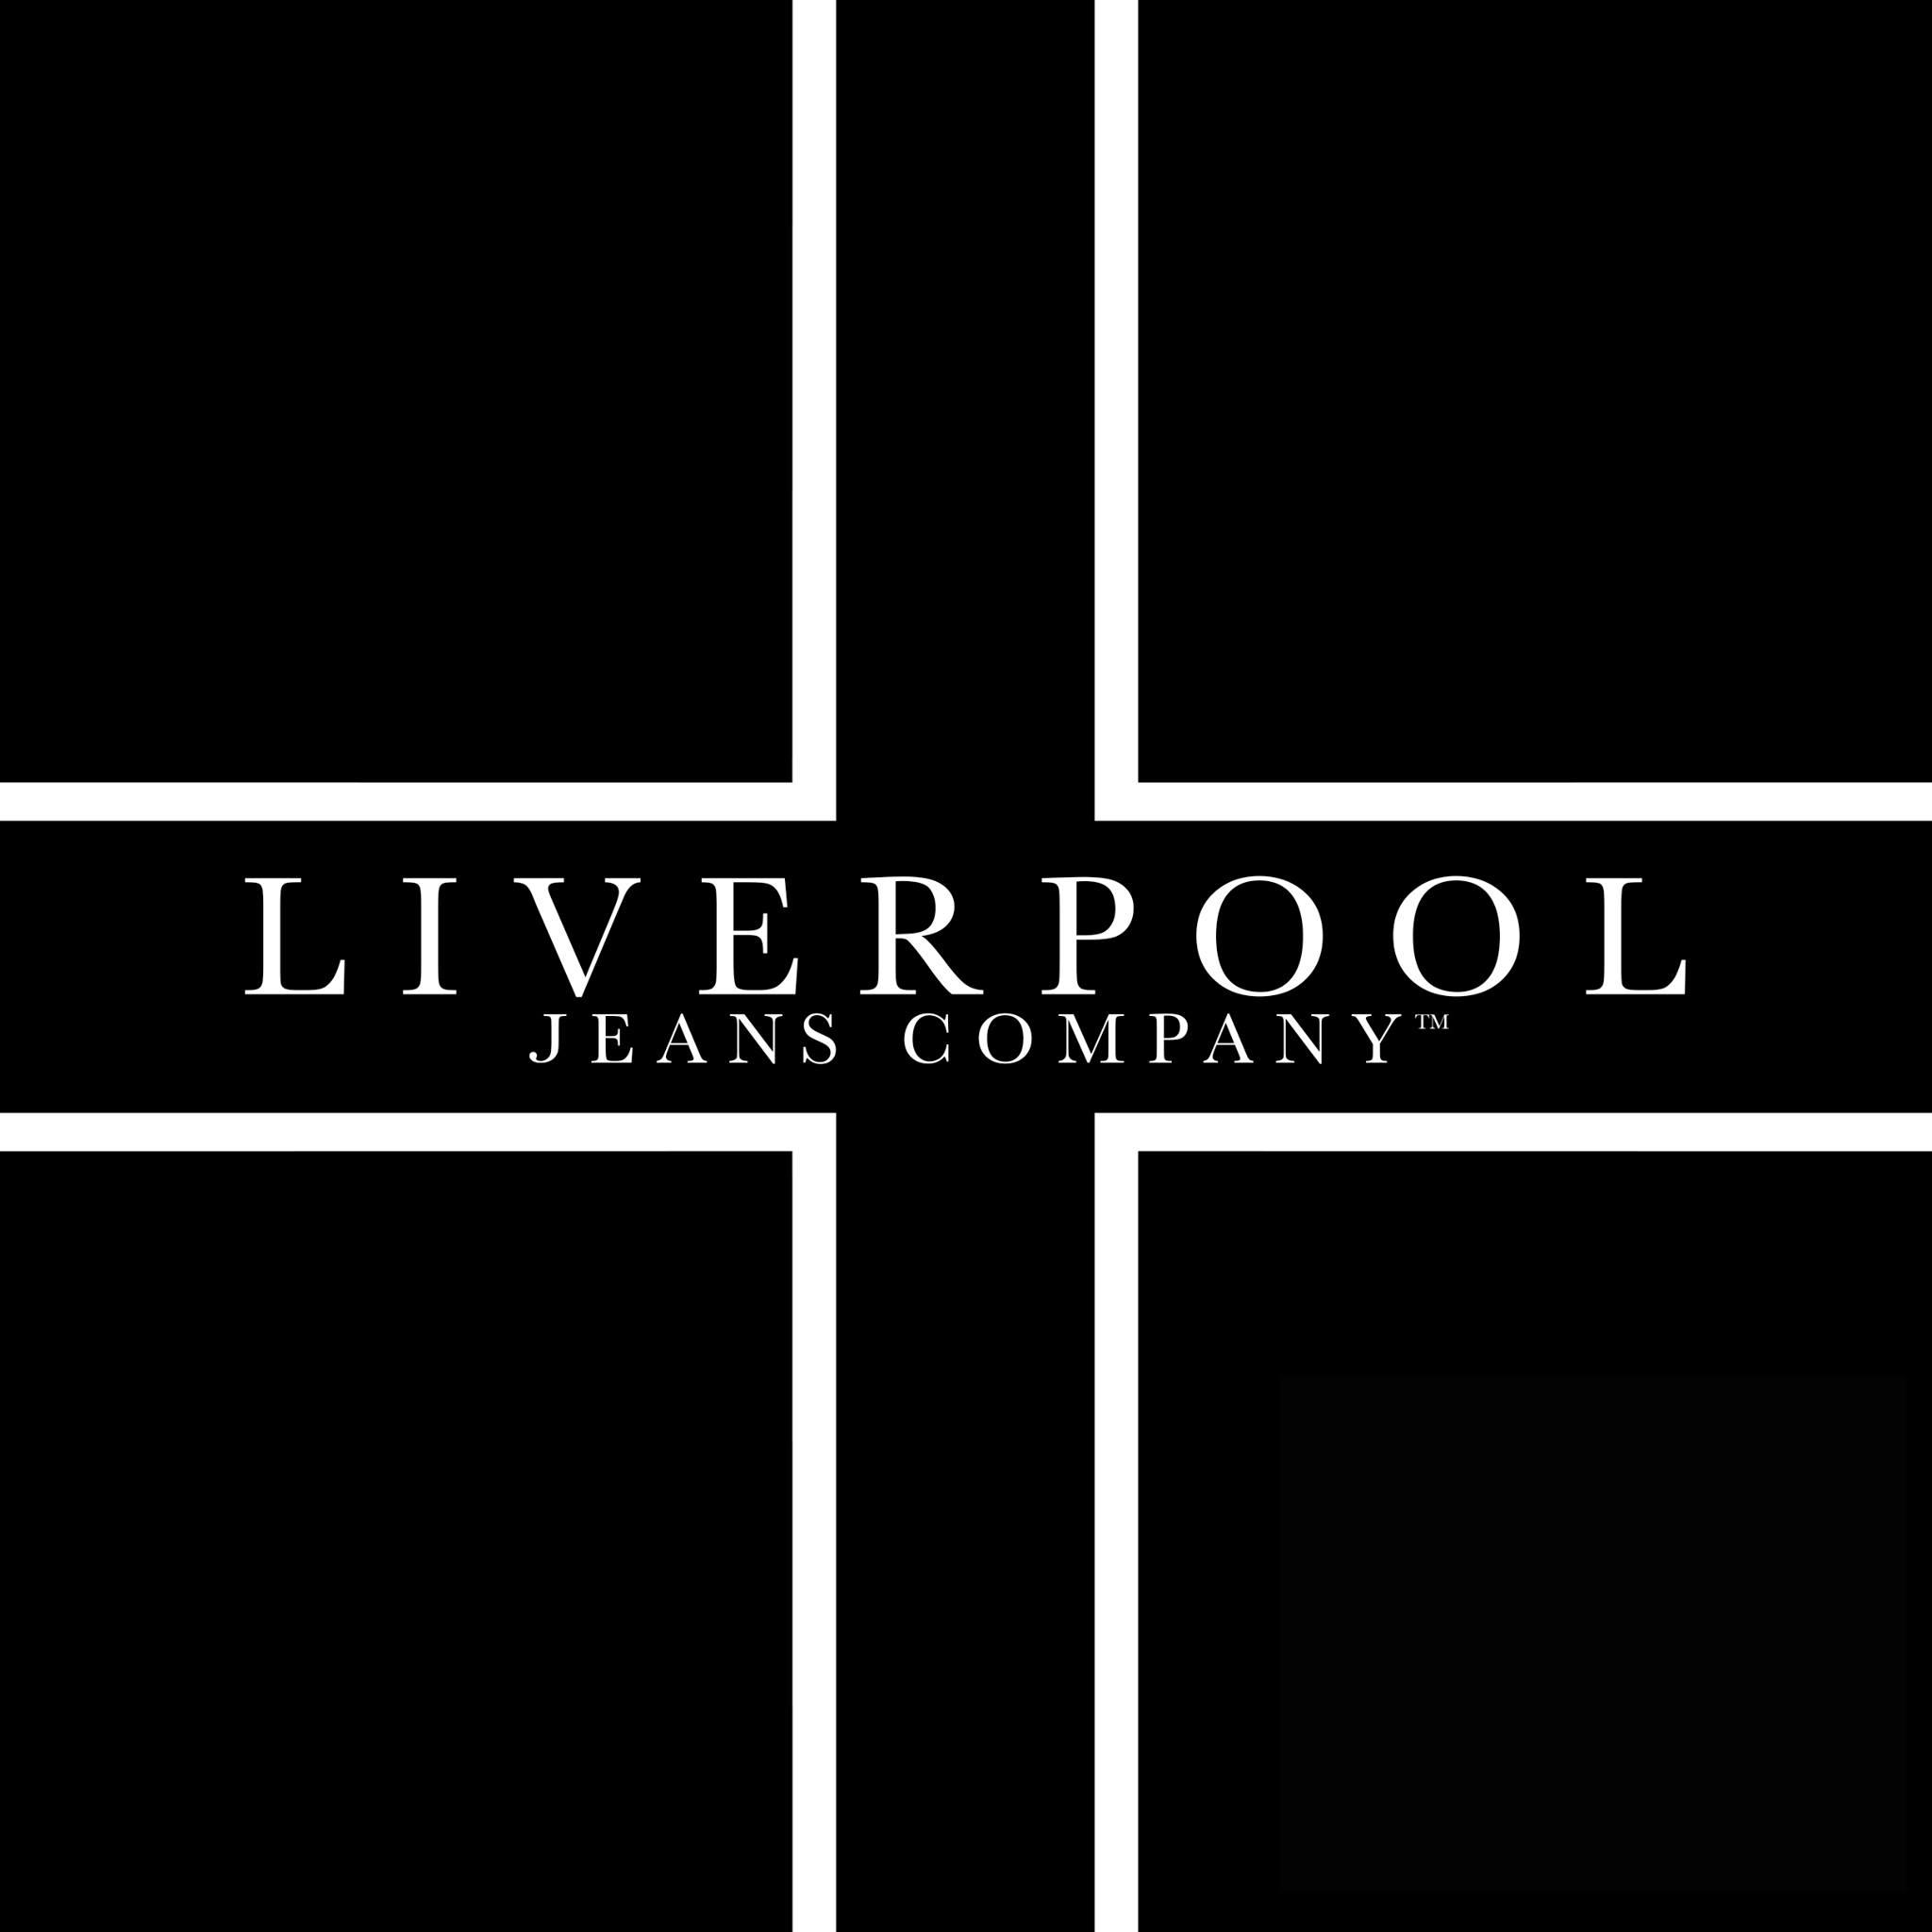 liverpool jeans logo.jpg